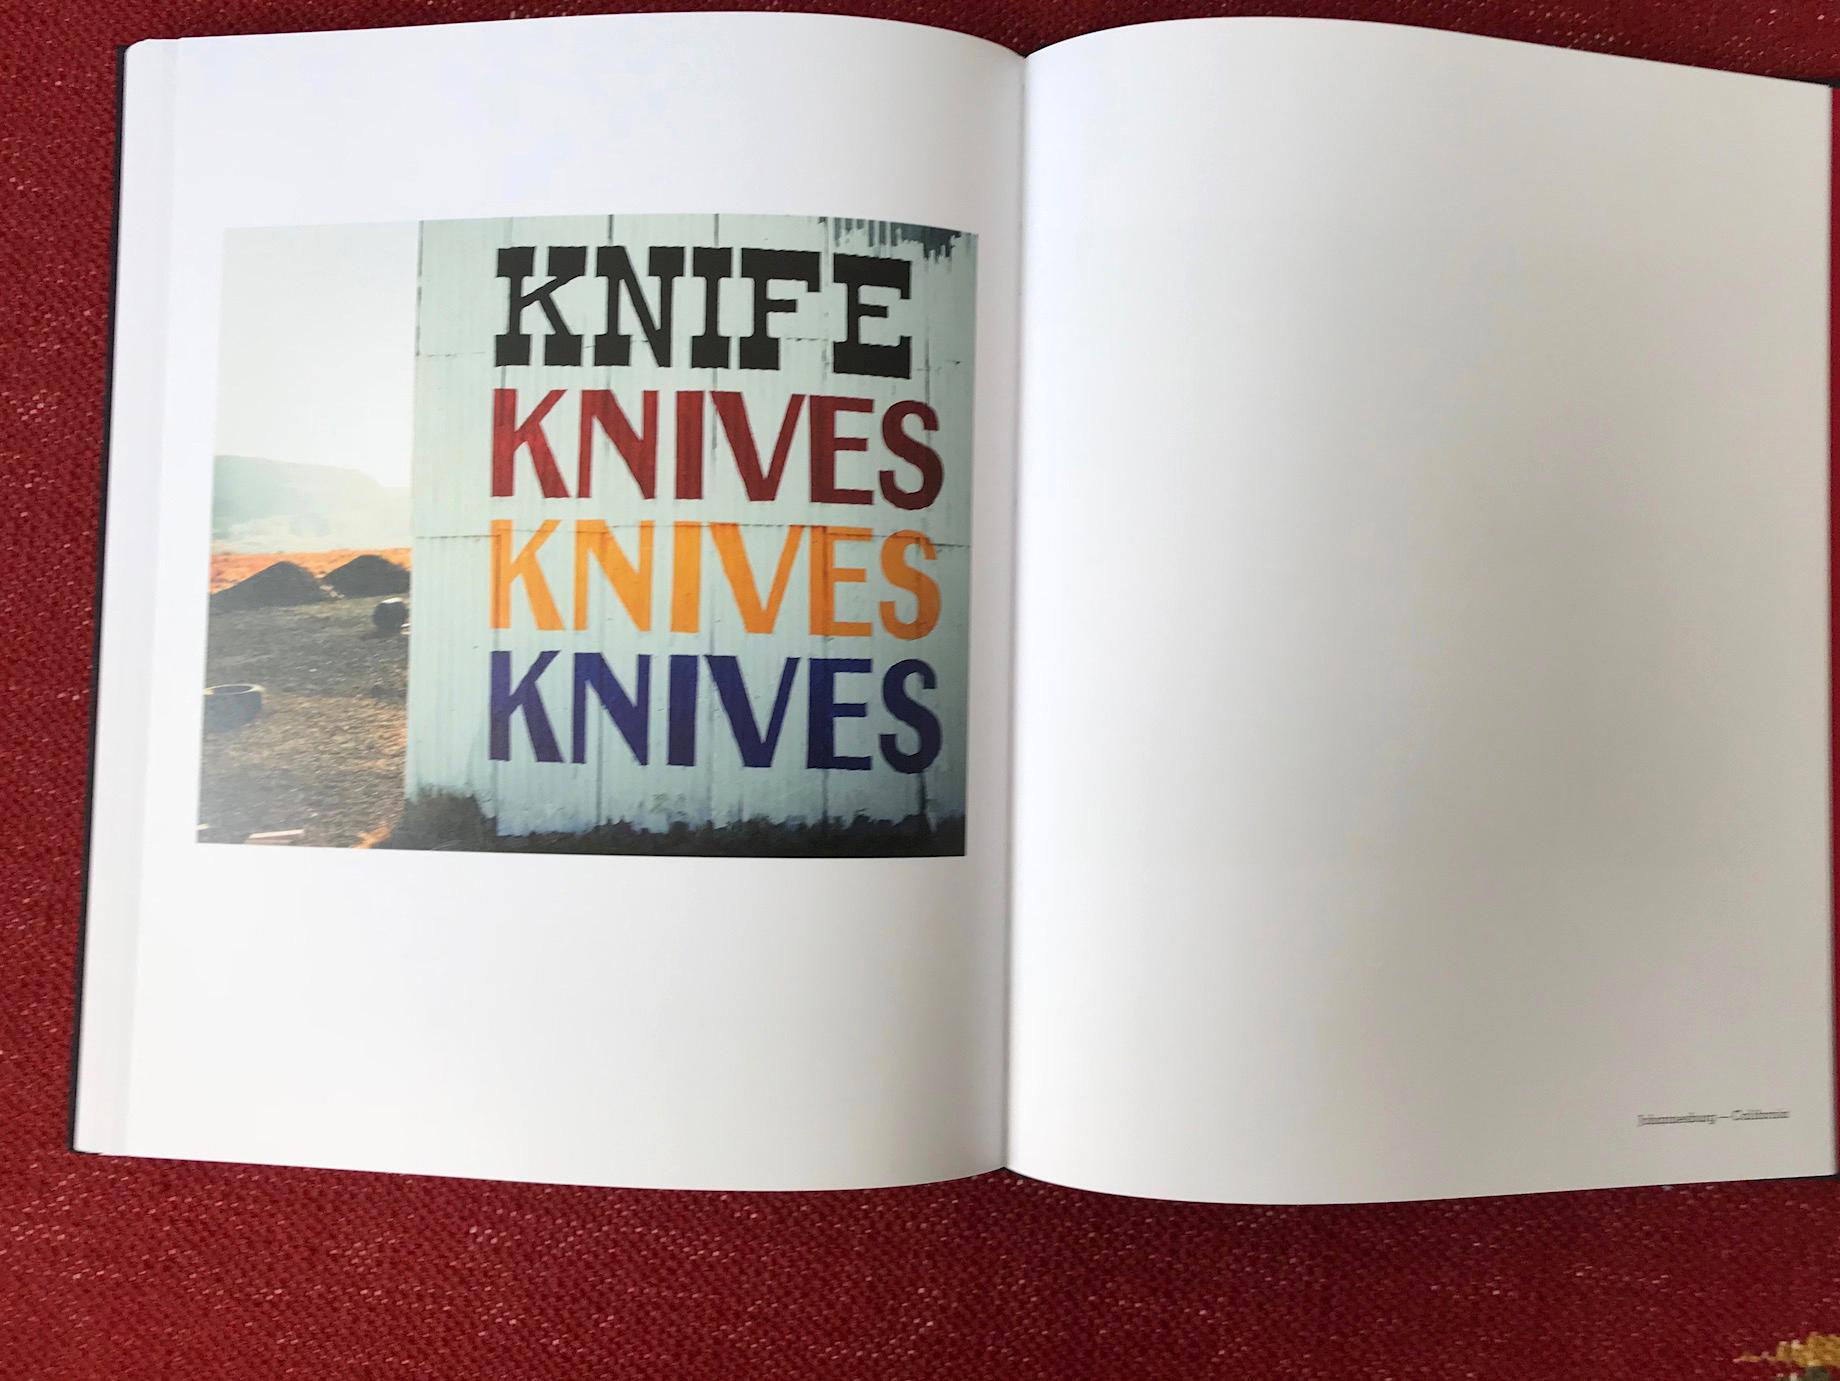 dfc-knives-site.jpg